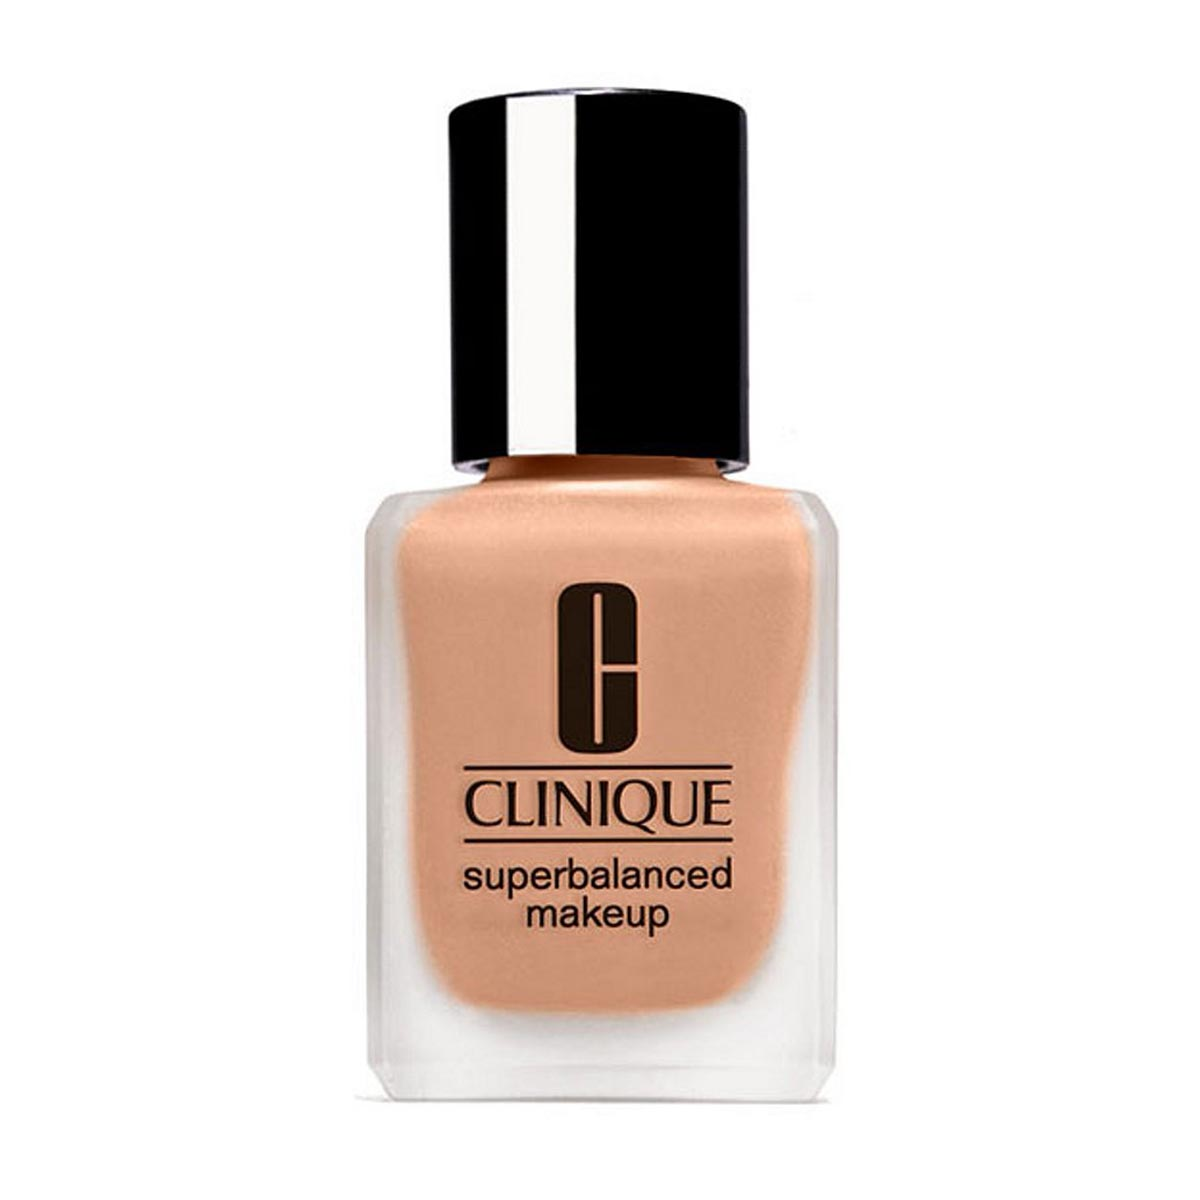 Clinique superbalanced make up spf15 10 clin col maq superbal spf15 10 honeymilk